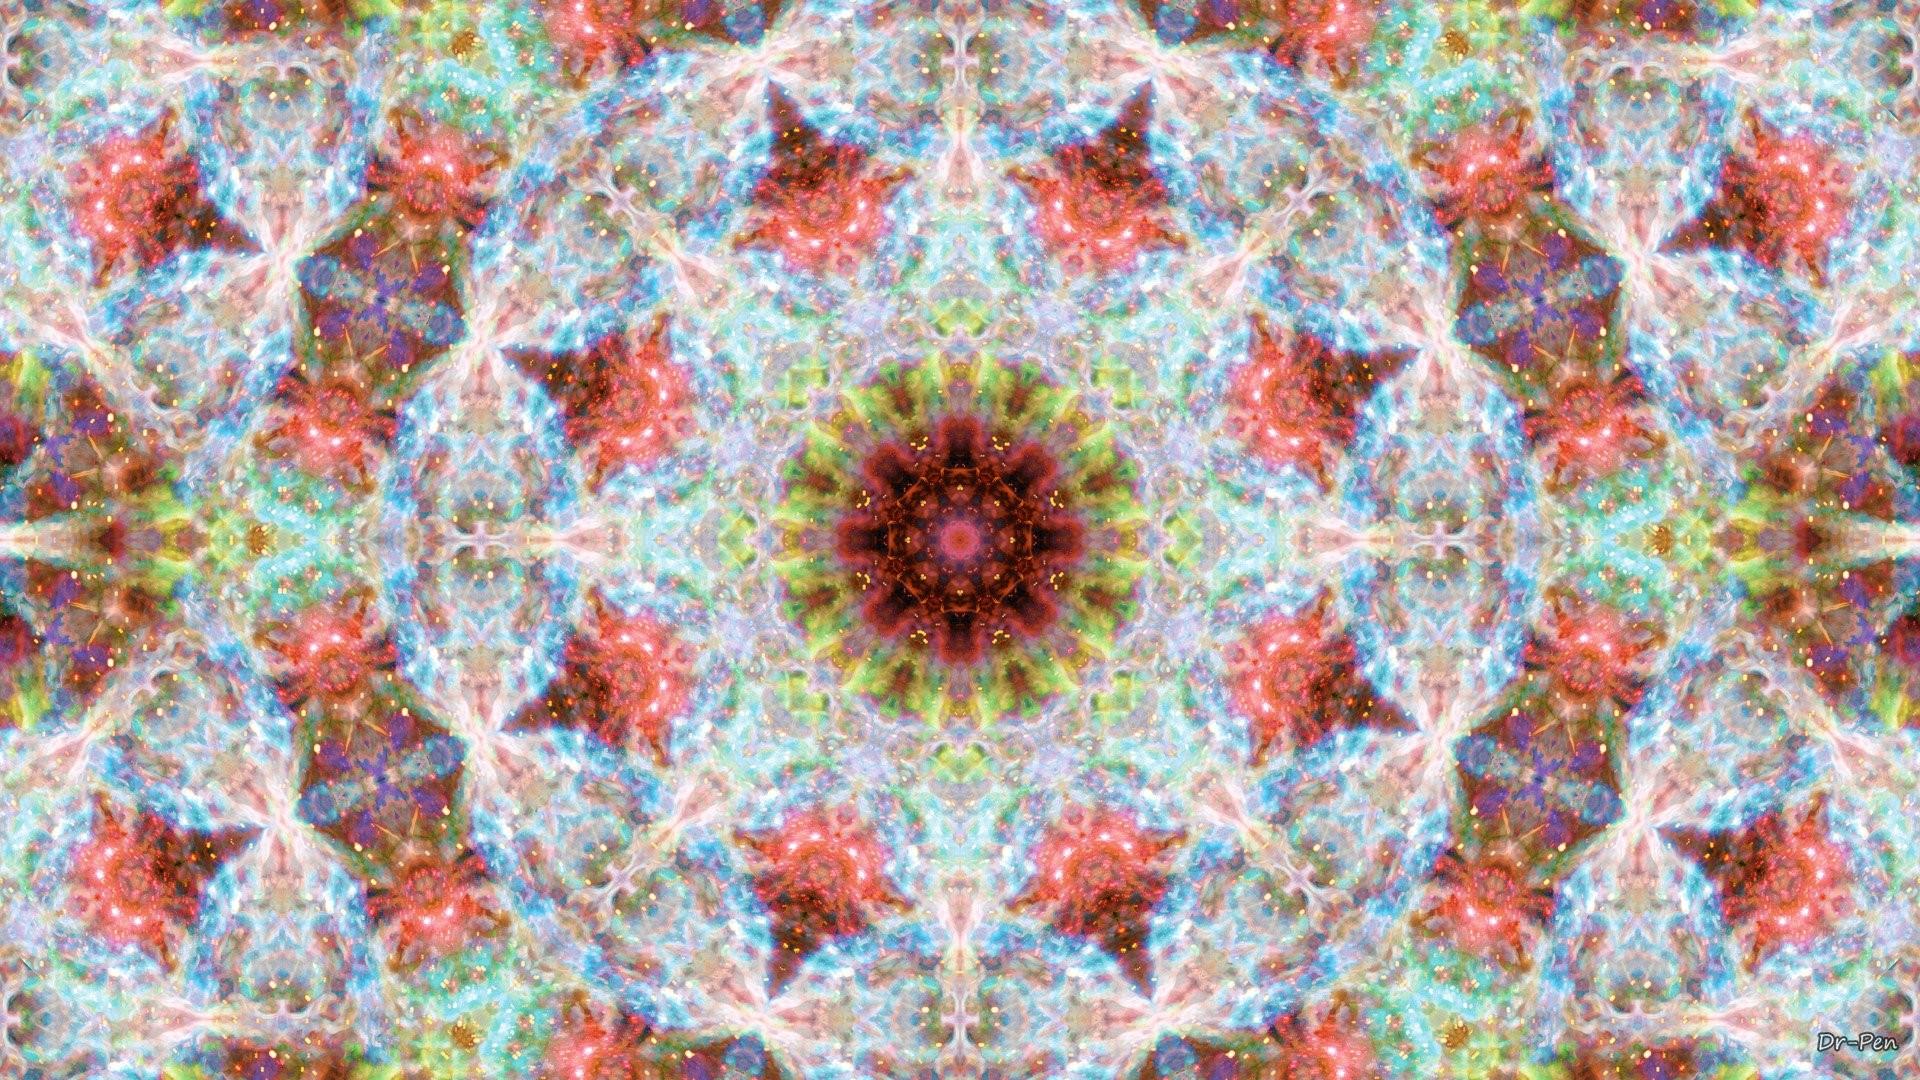 Abstrakt РM̦nster Artistisk Manipulation Digital Abstrakt Mandala Space  Galax Bakgrund